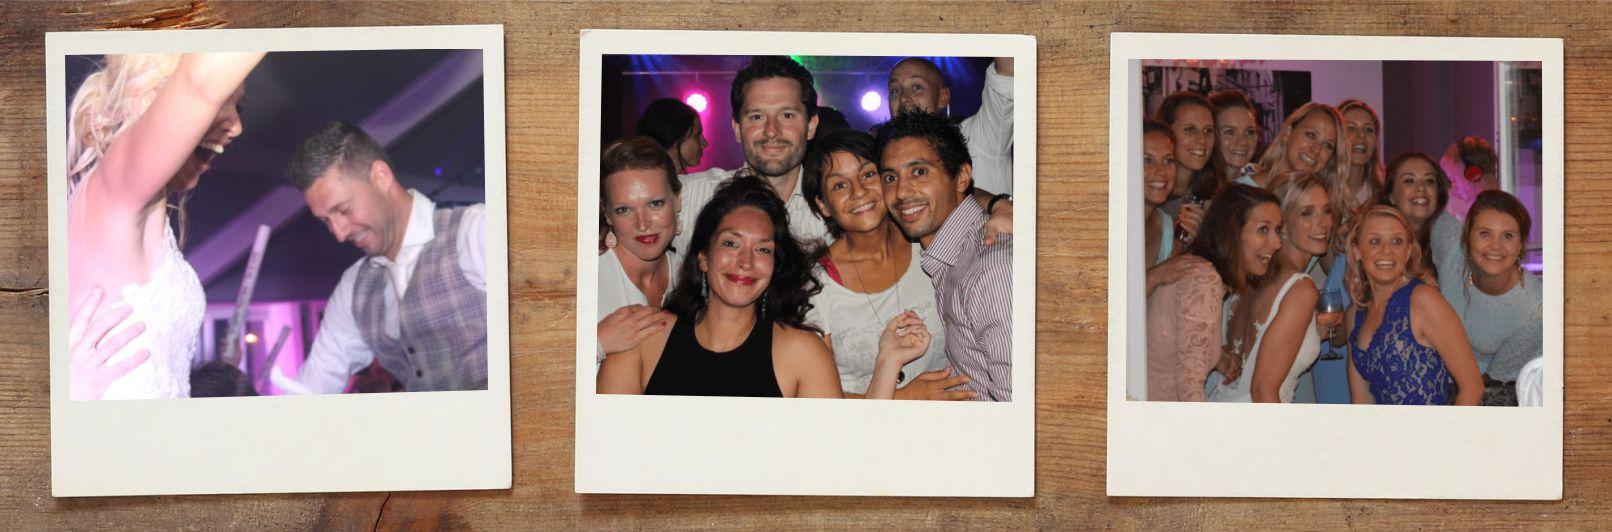 Polaroid fotograaf op feest